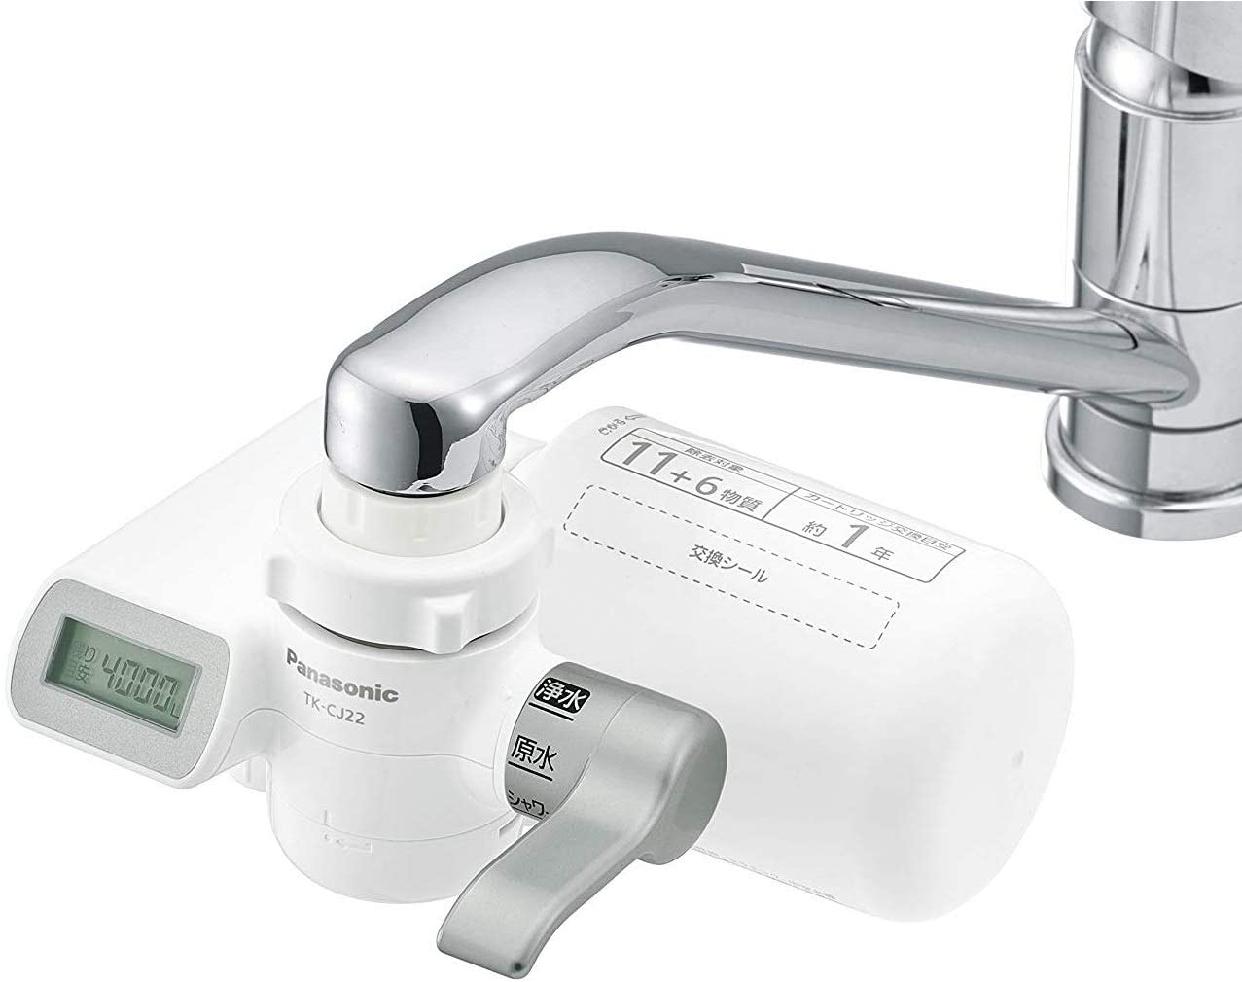 Panasonic(パナソニック)浄水器 TK-CJ22の商品画像